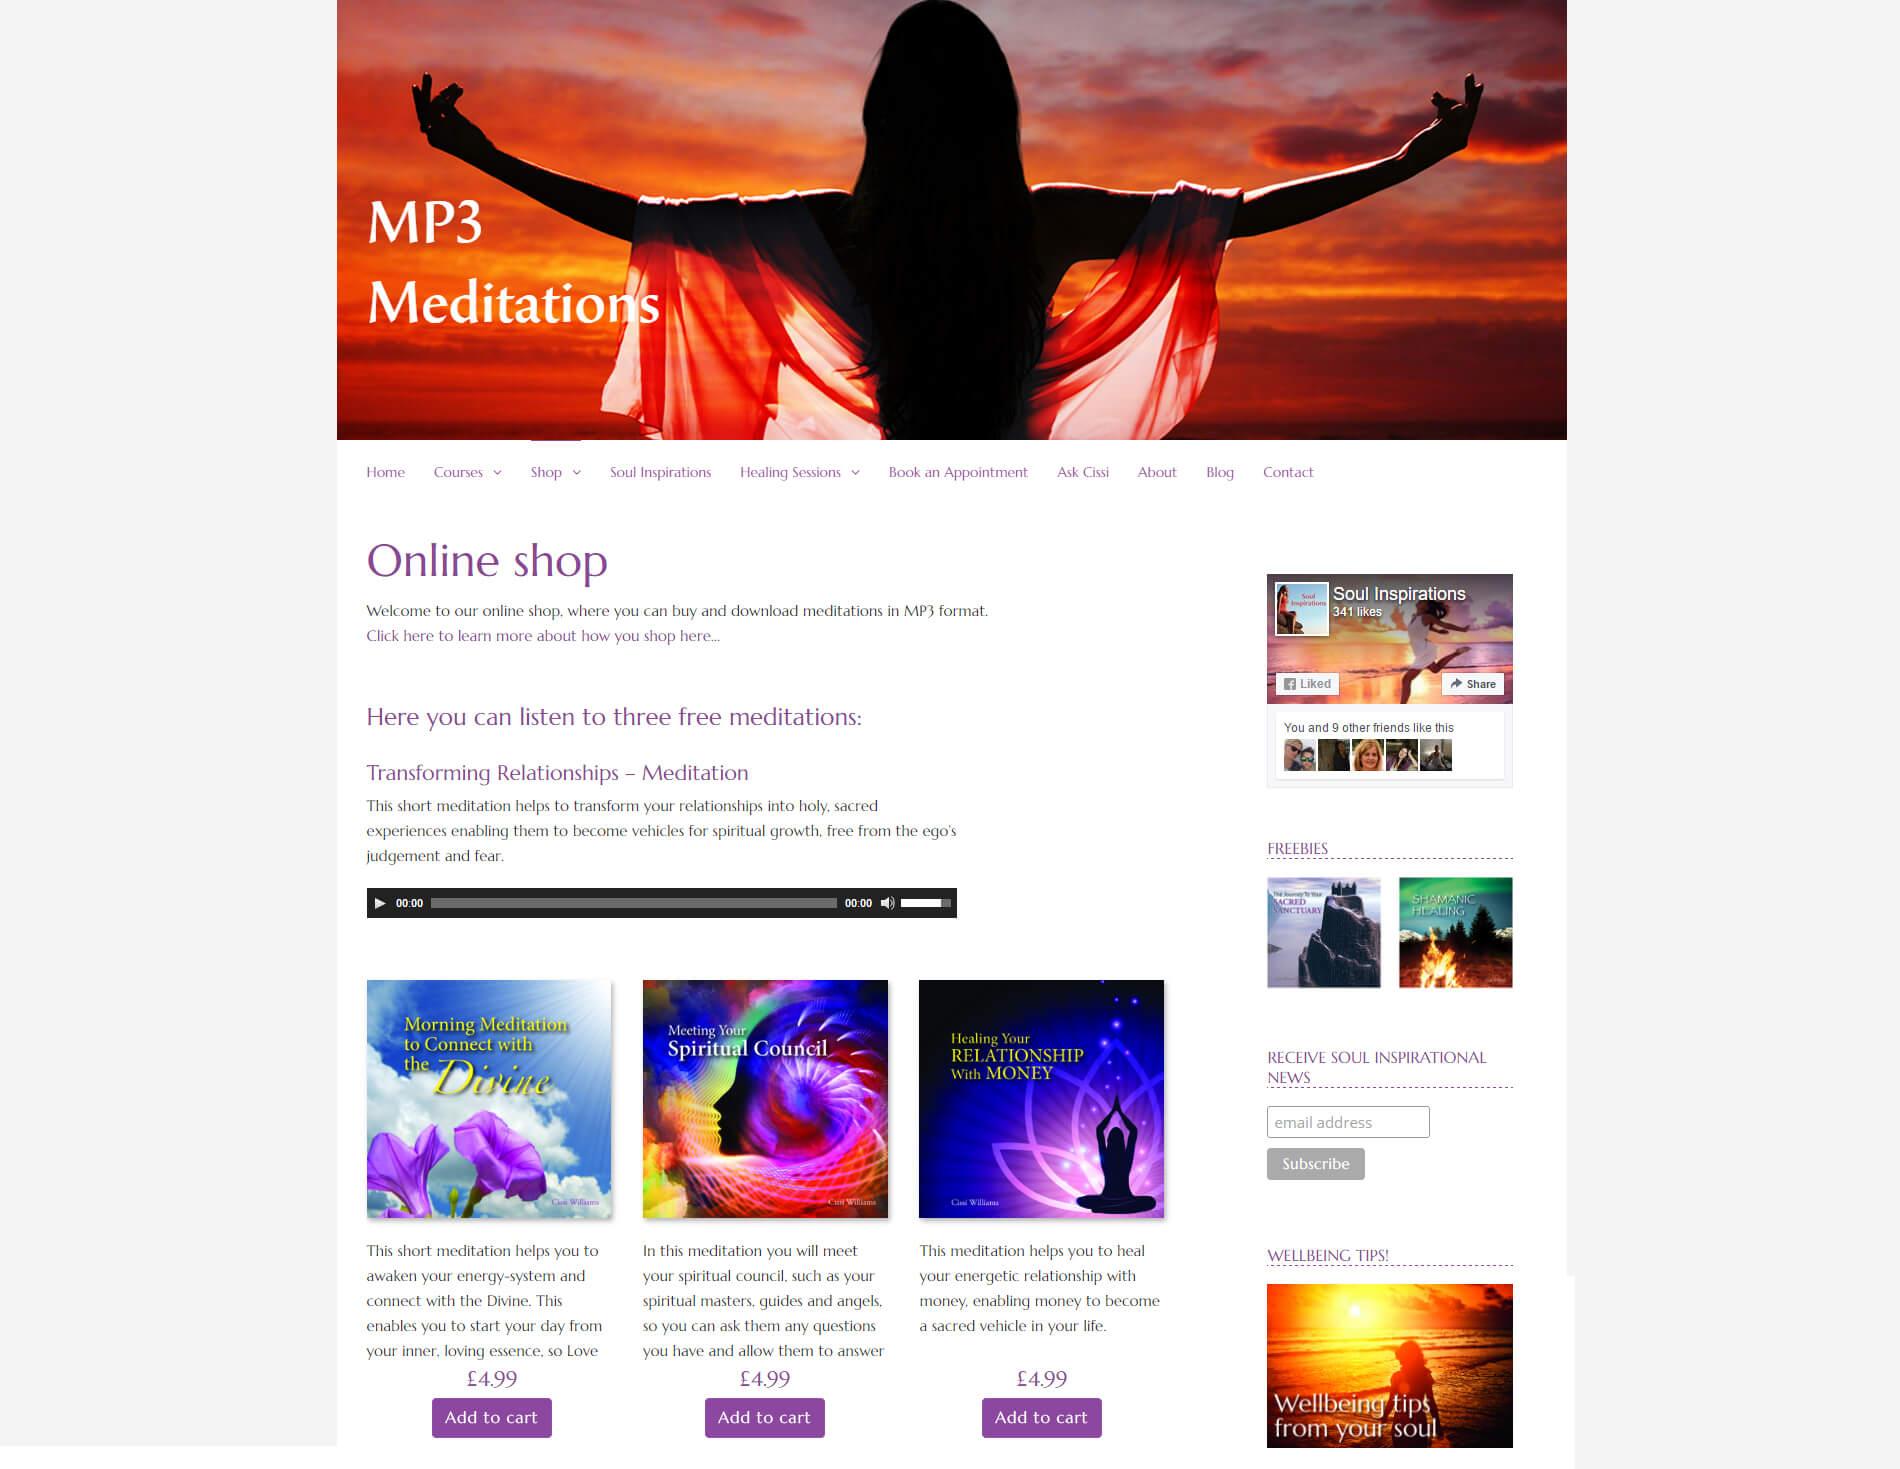 anweb Webbdesign Webbshop Soul Inspirations